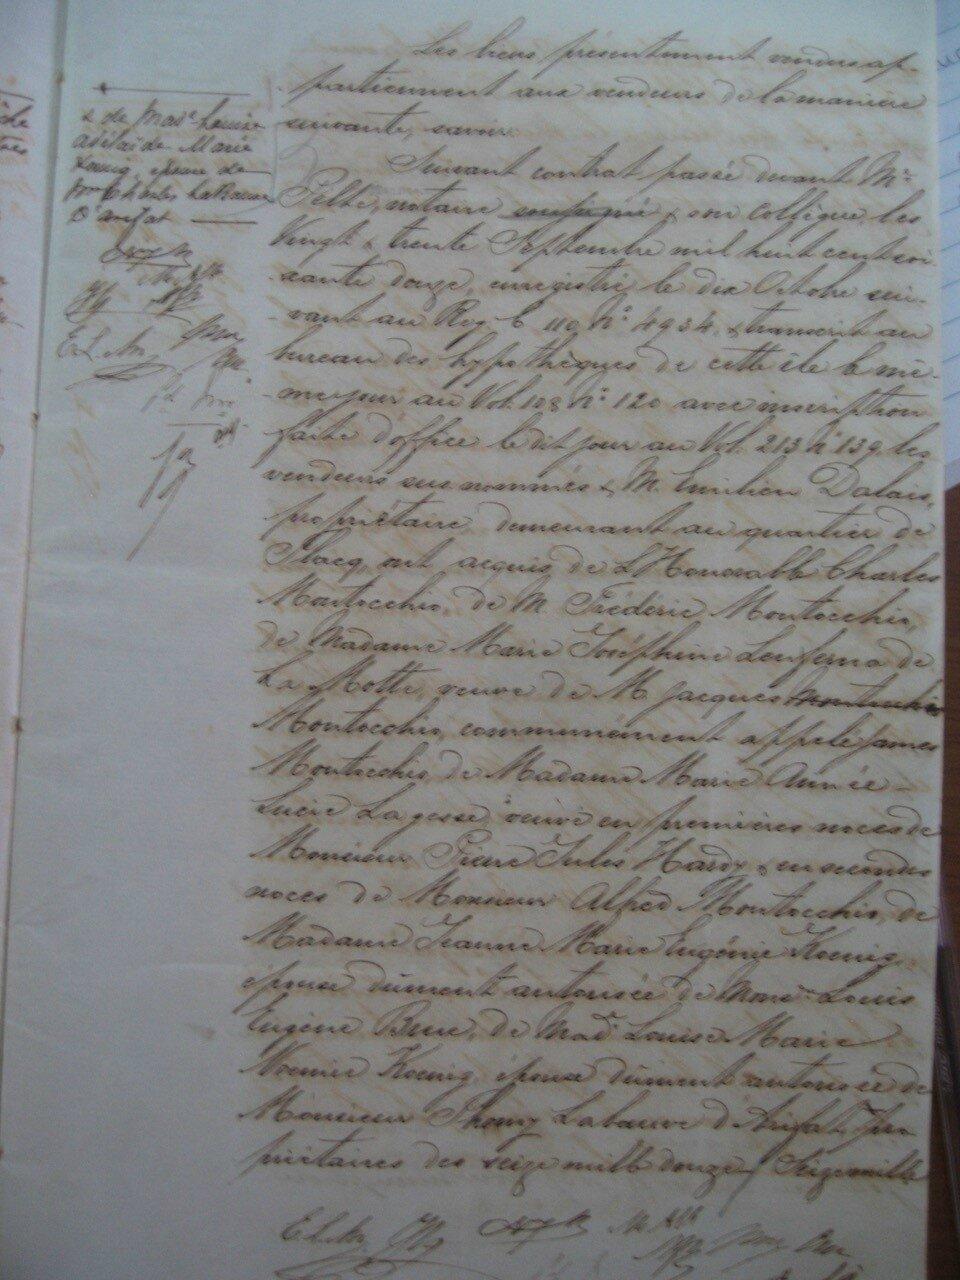 Beau Rivage_Contrat de vente 1878 p6_Marie Helene SHIM